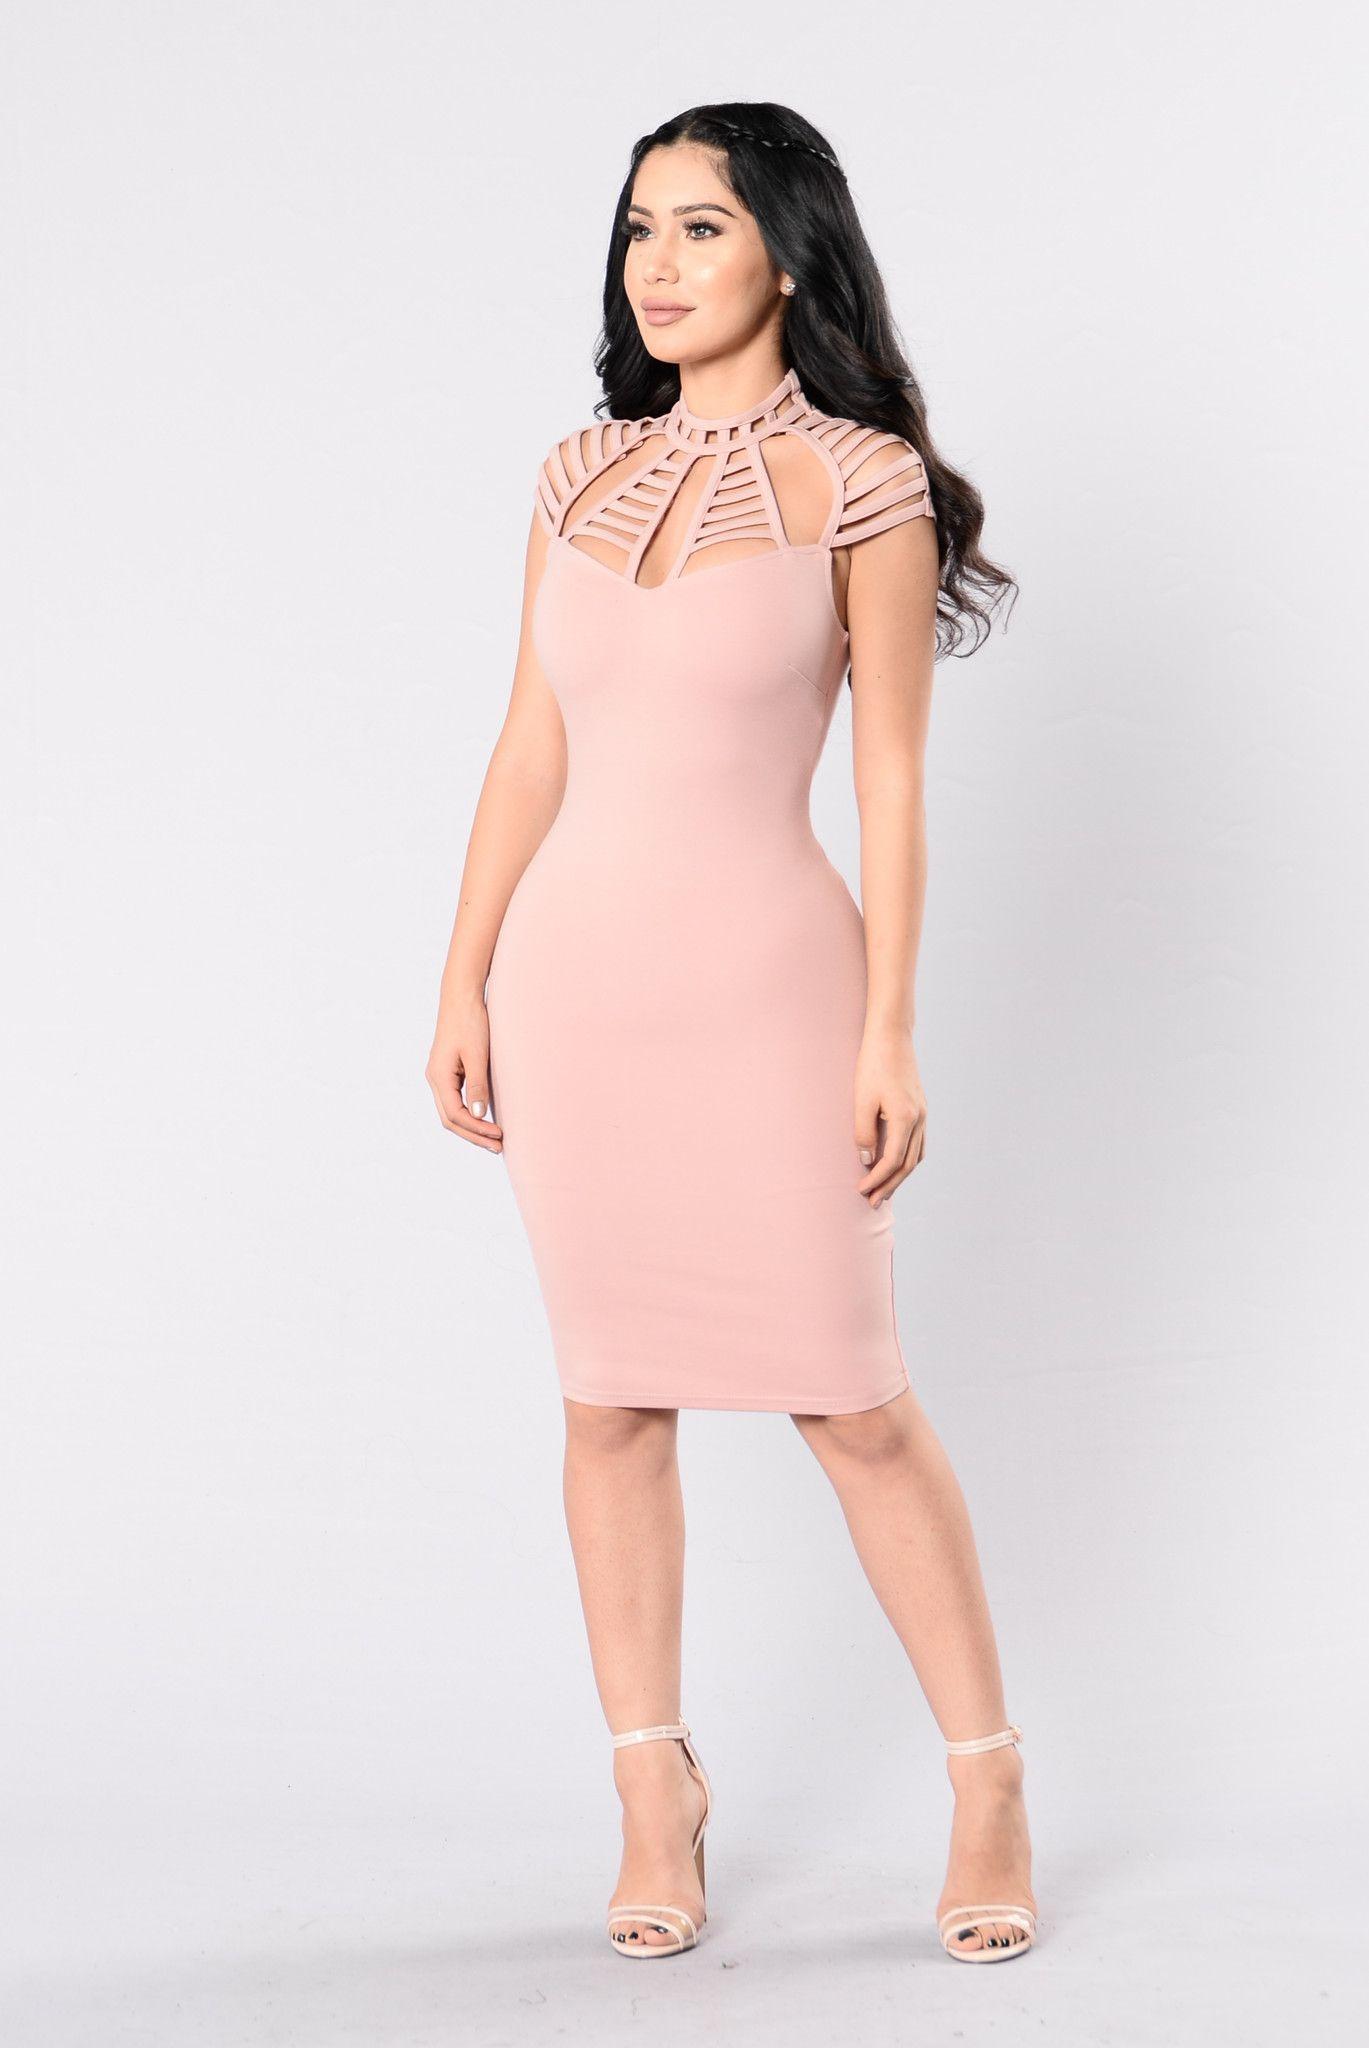 Stop and Stare Dress - Mauve